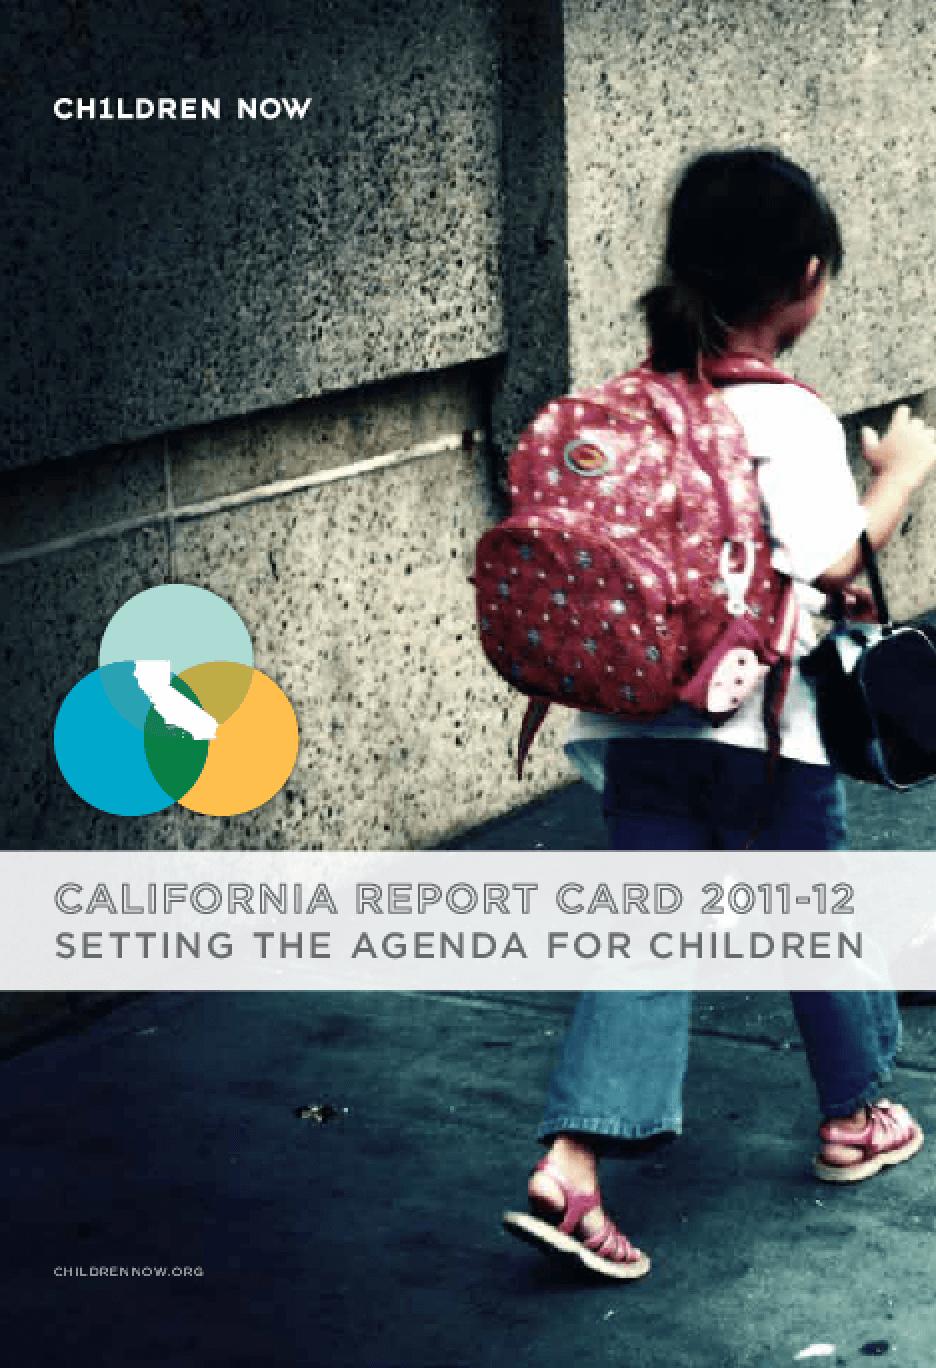 California Report Card 2011: Setting the Agenda for Children